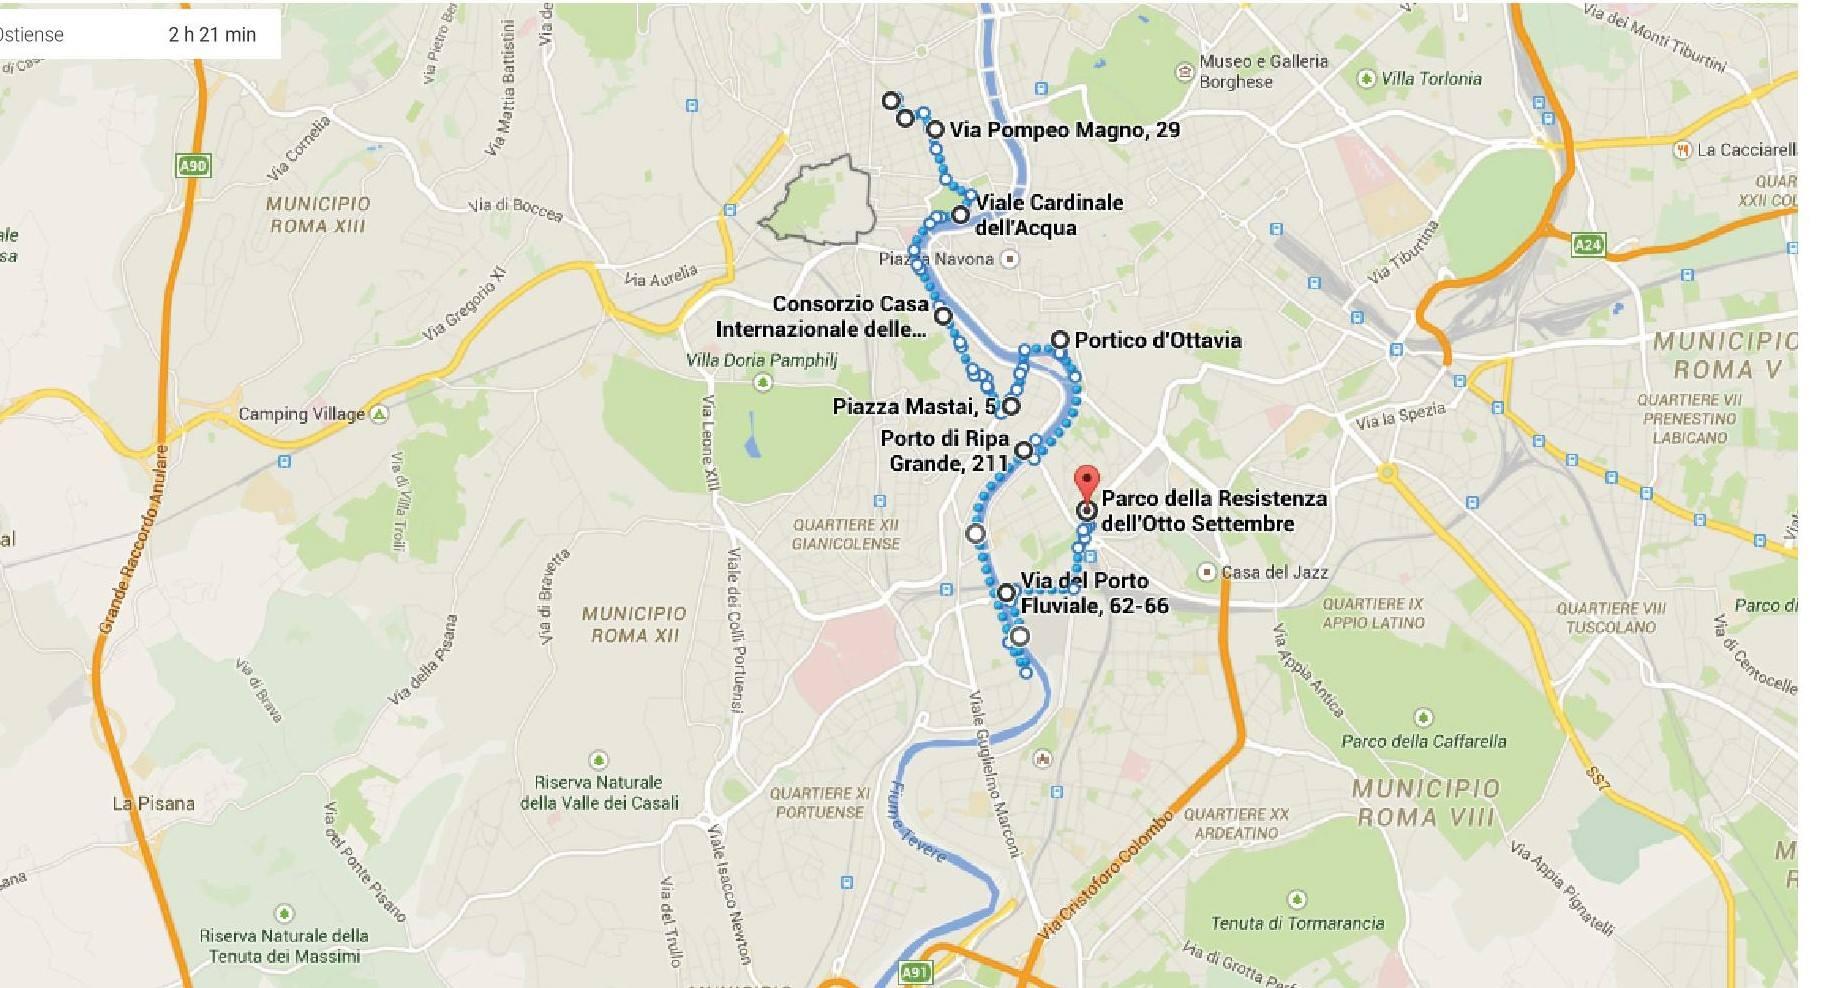 mappa 25 aprile